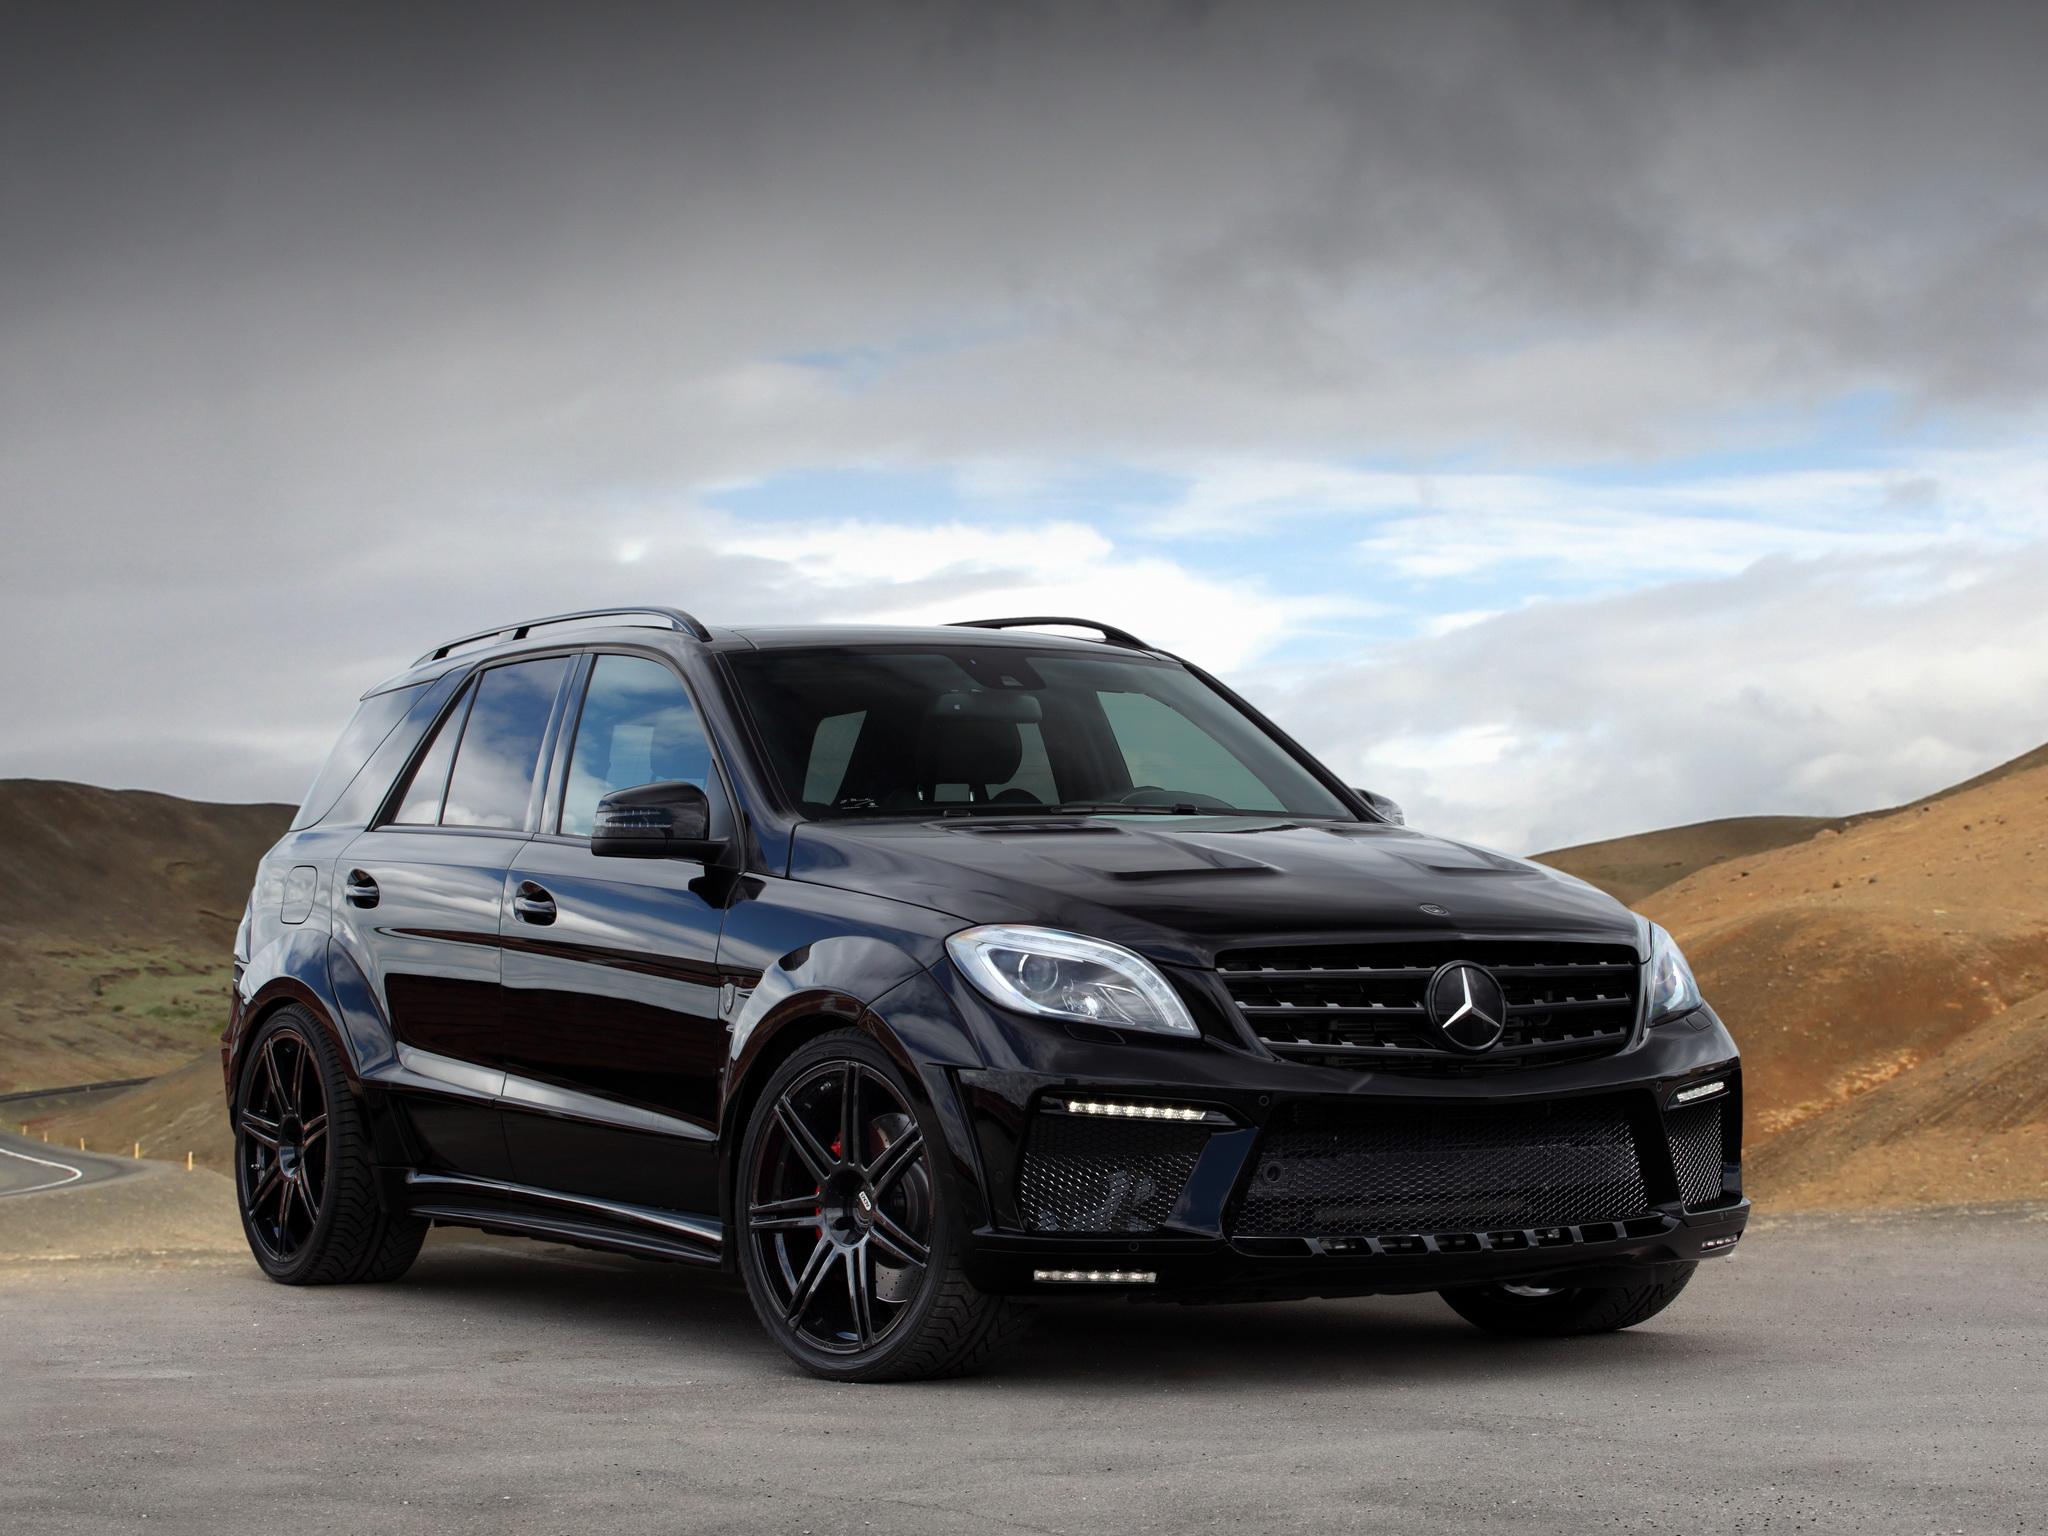 2012 topcar mercedes benz m klasse inferno w166 tuning suv h wallpaper 2048x1536 147725 wallpaperup - Mercedes Suv 2012